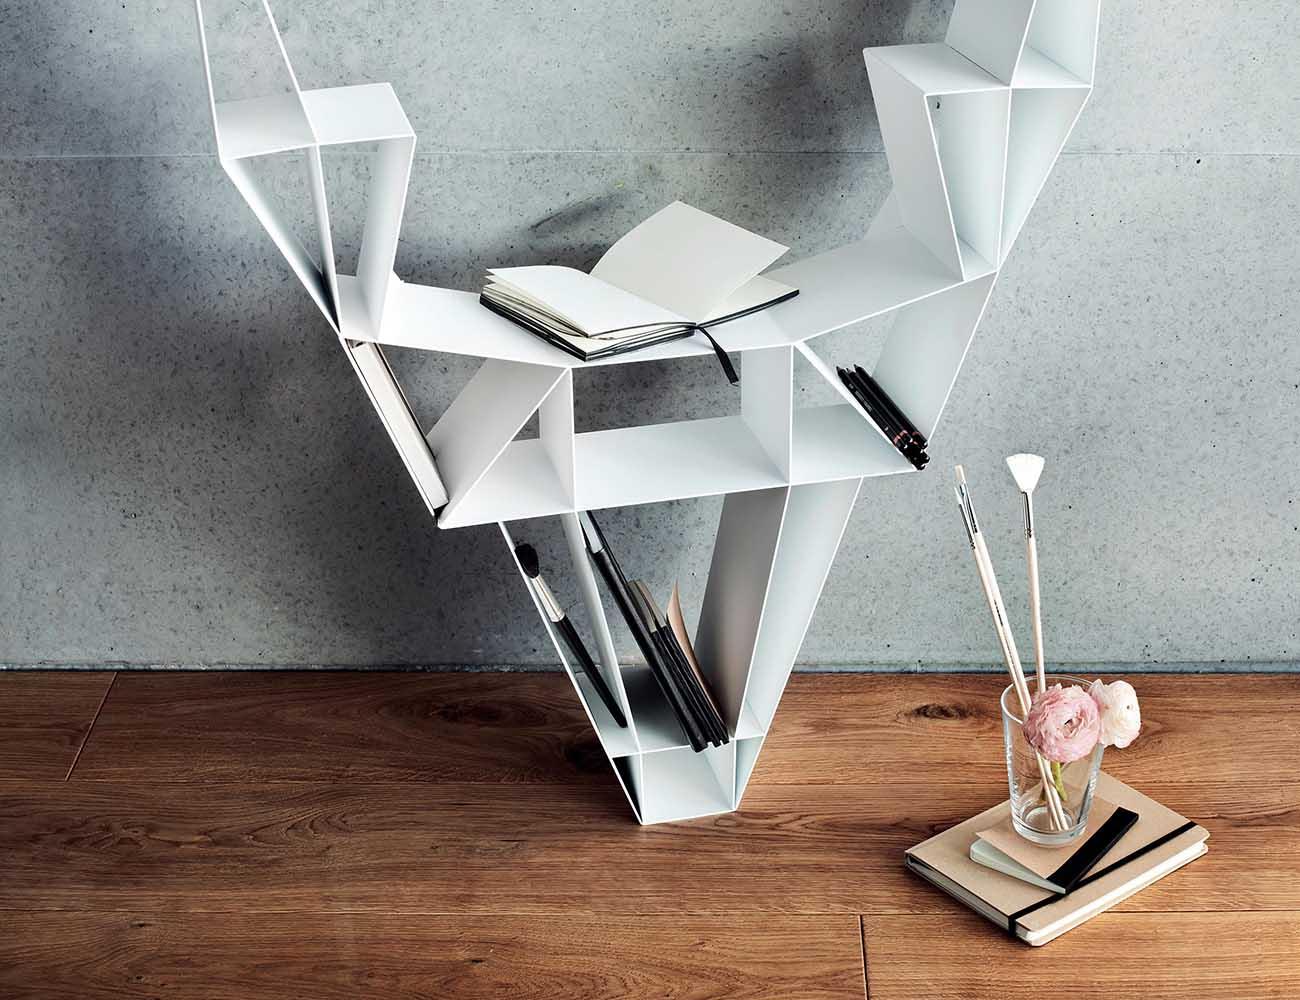 Deer Shelf – Impressive Bookshelf Inspired From Wild Deer